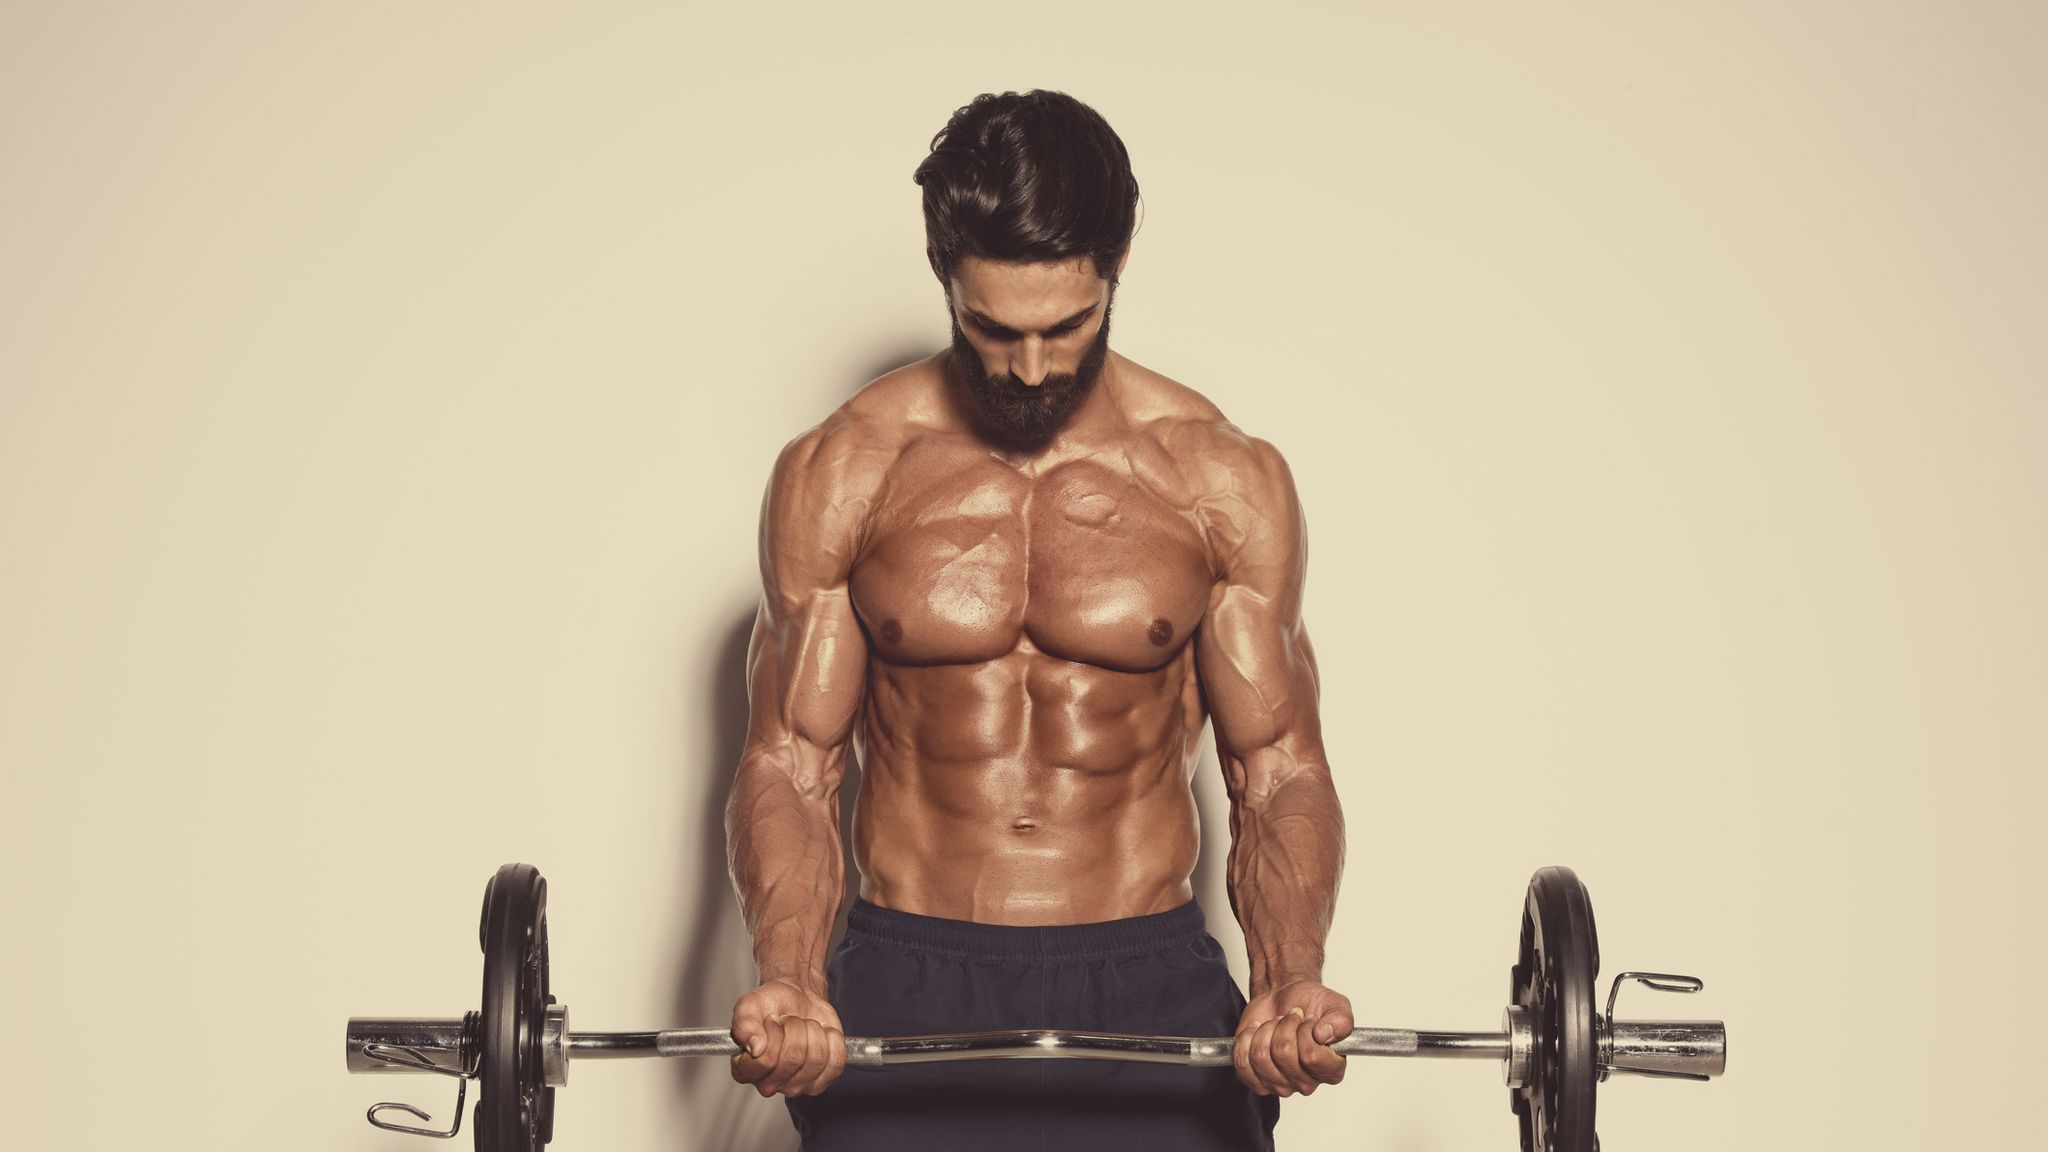 Bodybuilding forums online dating